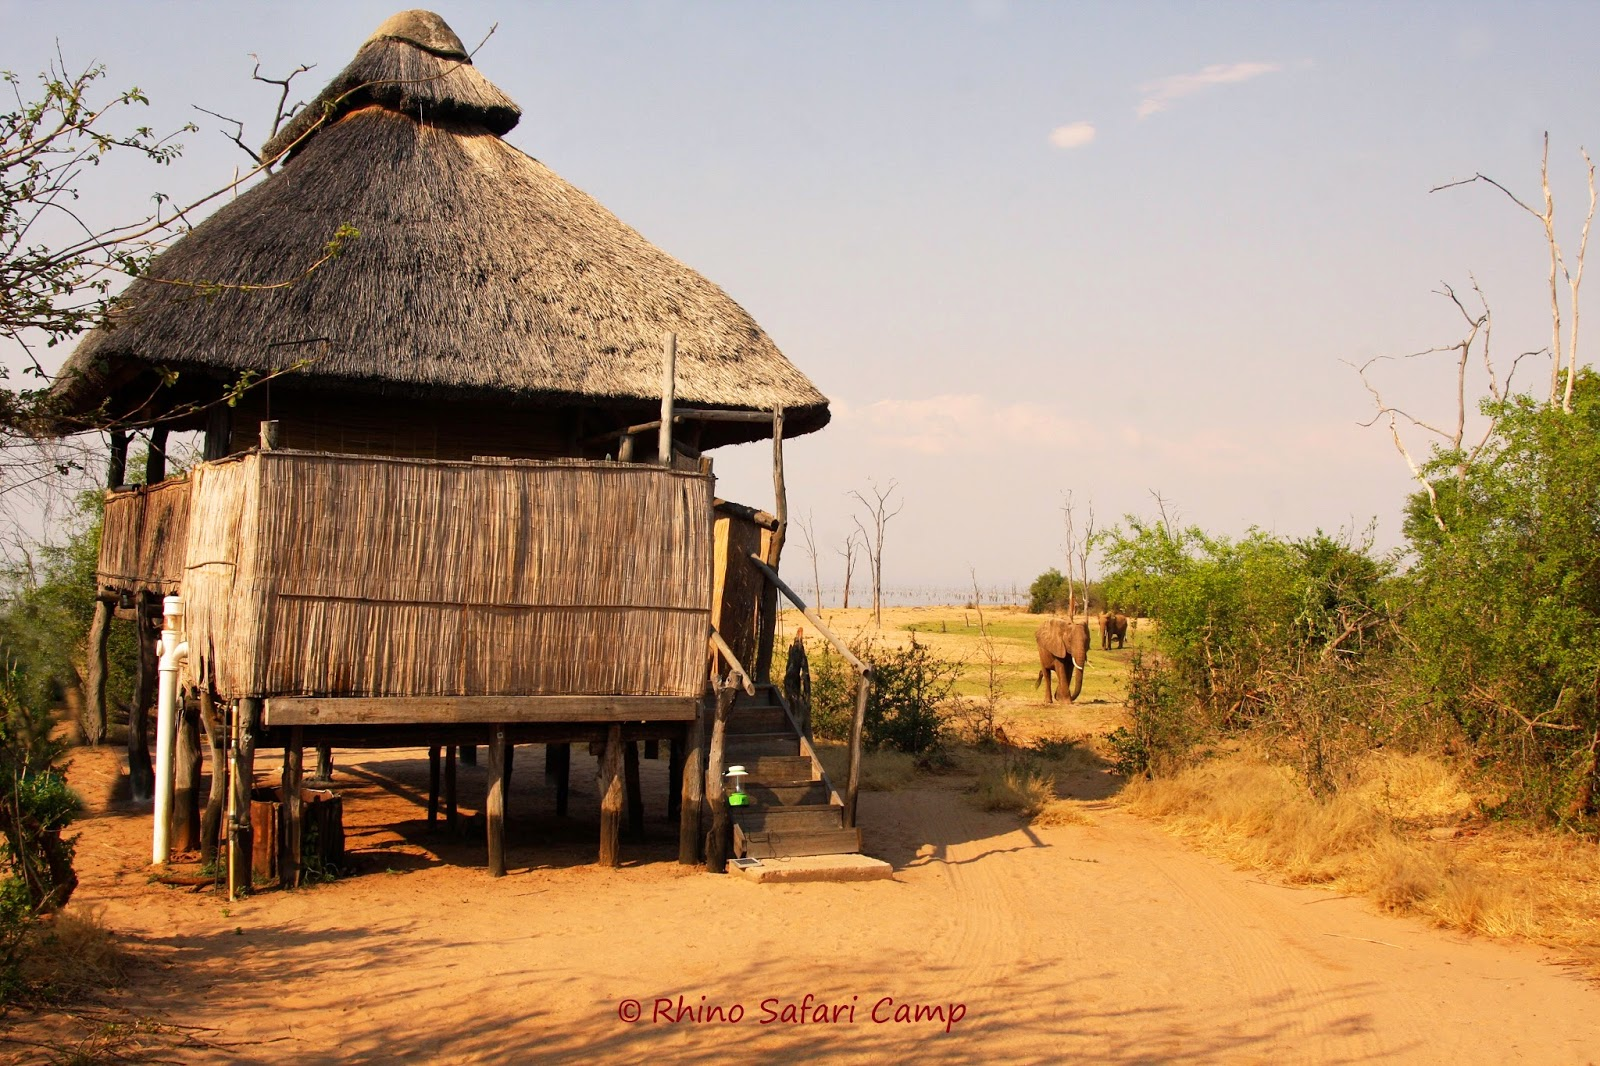 One of the rooms at Rhino Safari Camp, where elephants roam freely